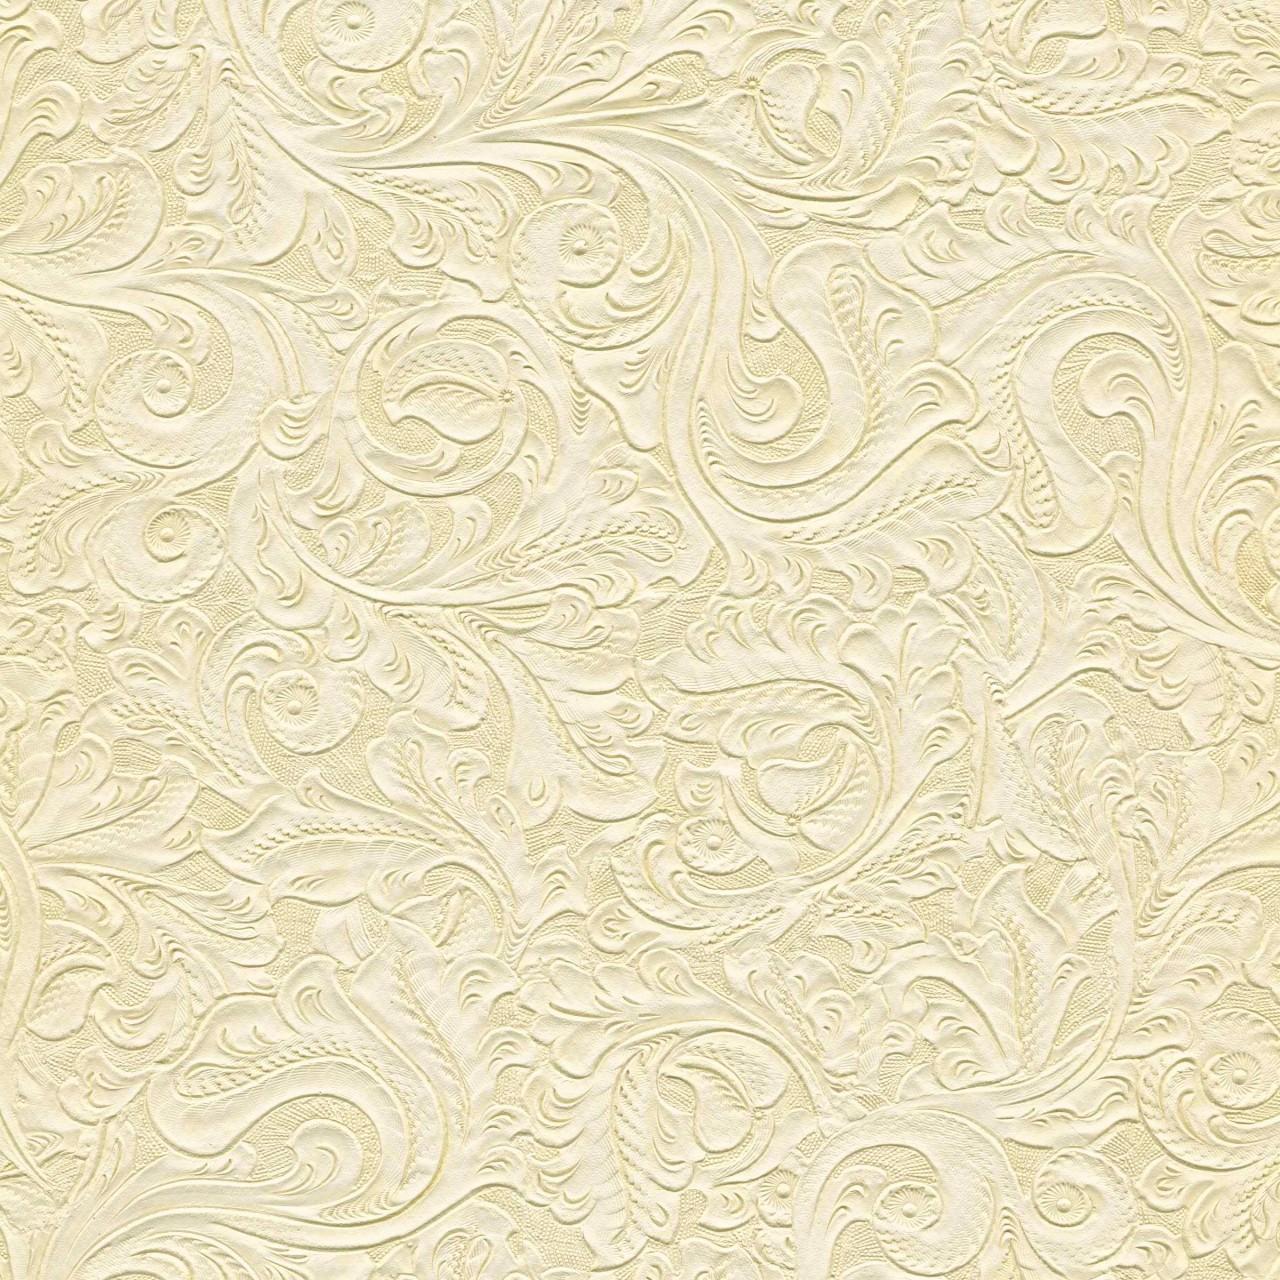 Ice Cream Wallpaper Hd: Cream Wallpapers